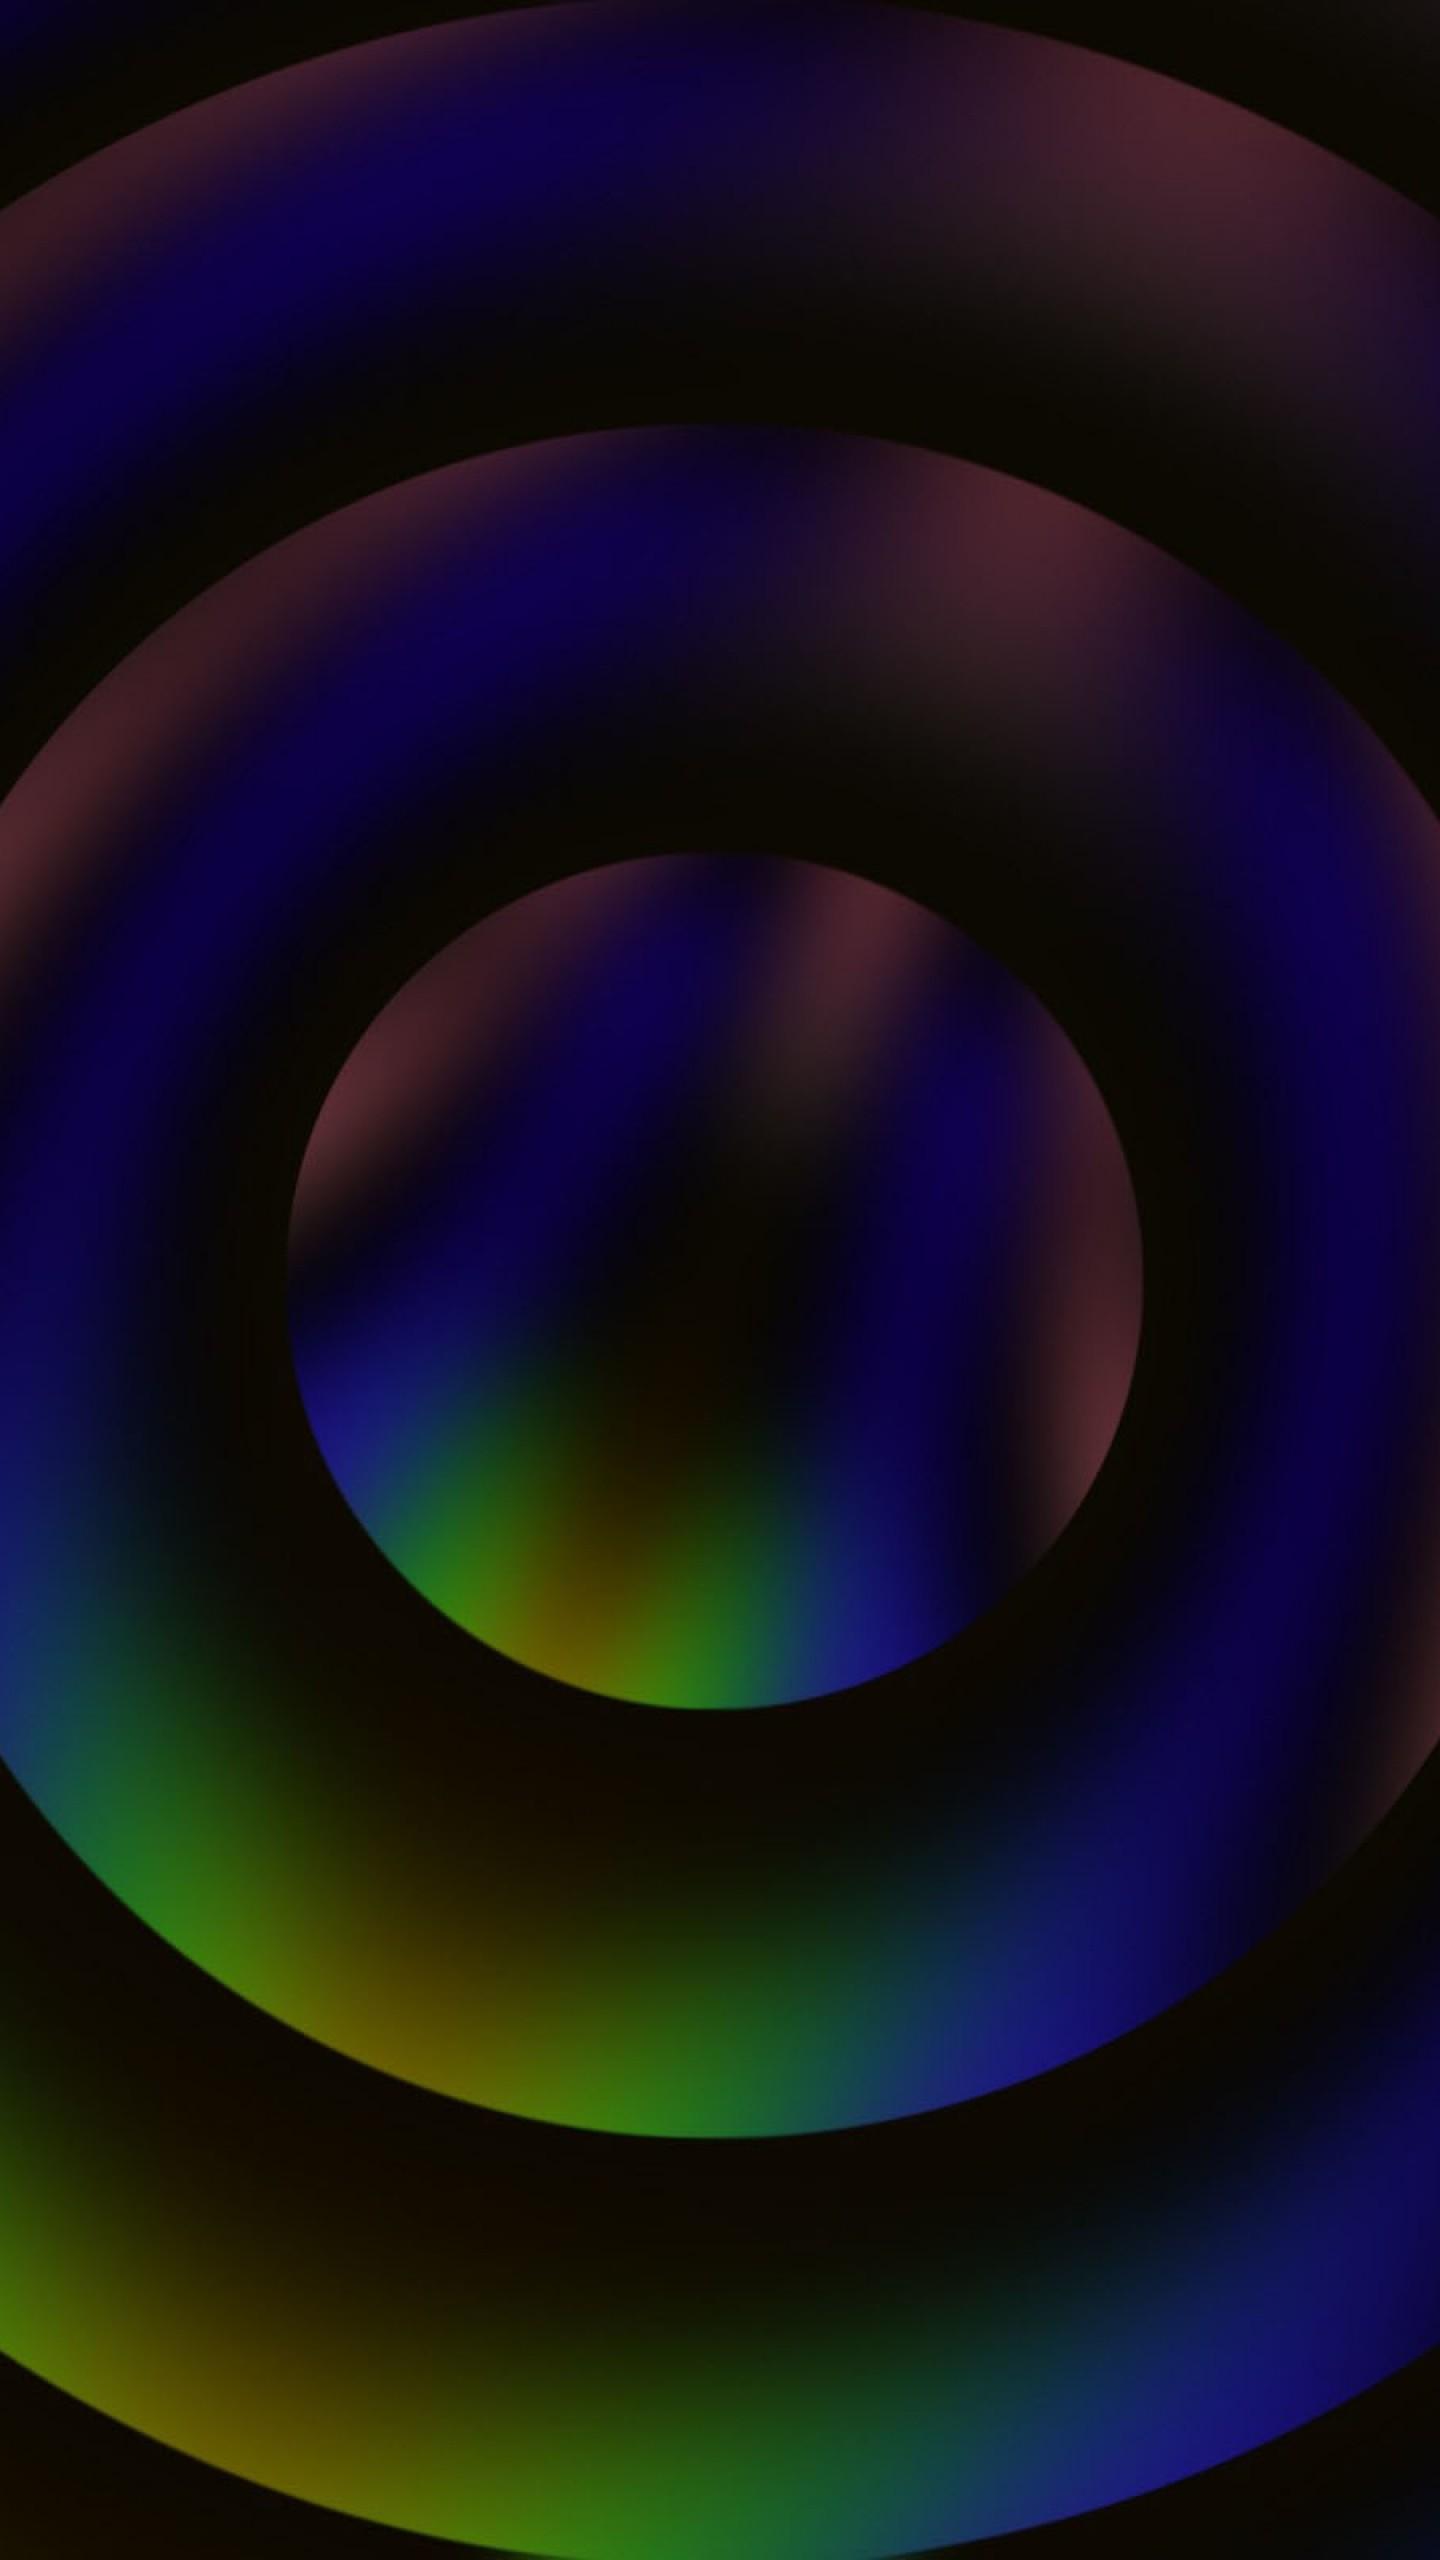 Wallpaper circles, abstract, dark, overflow